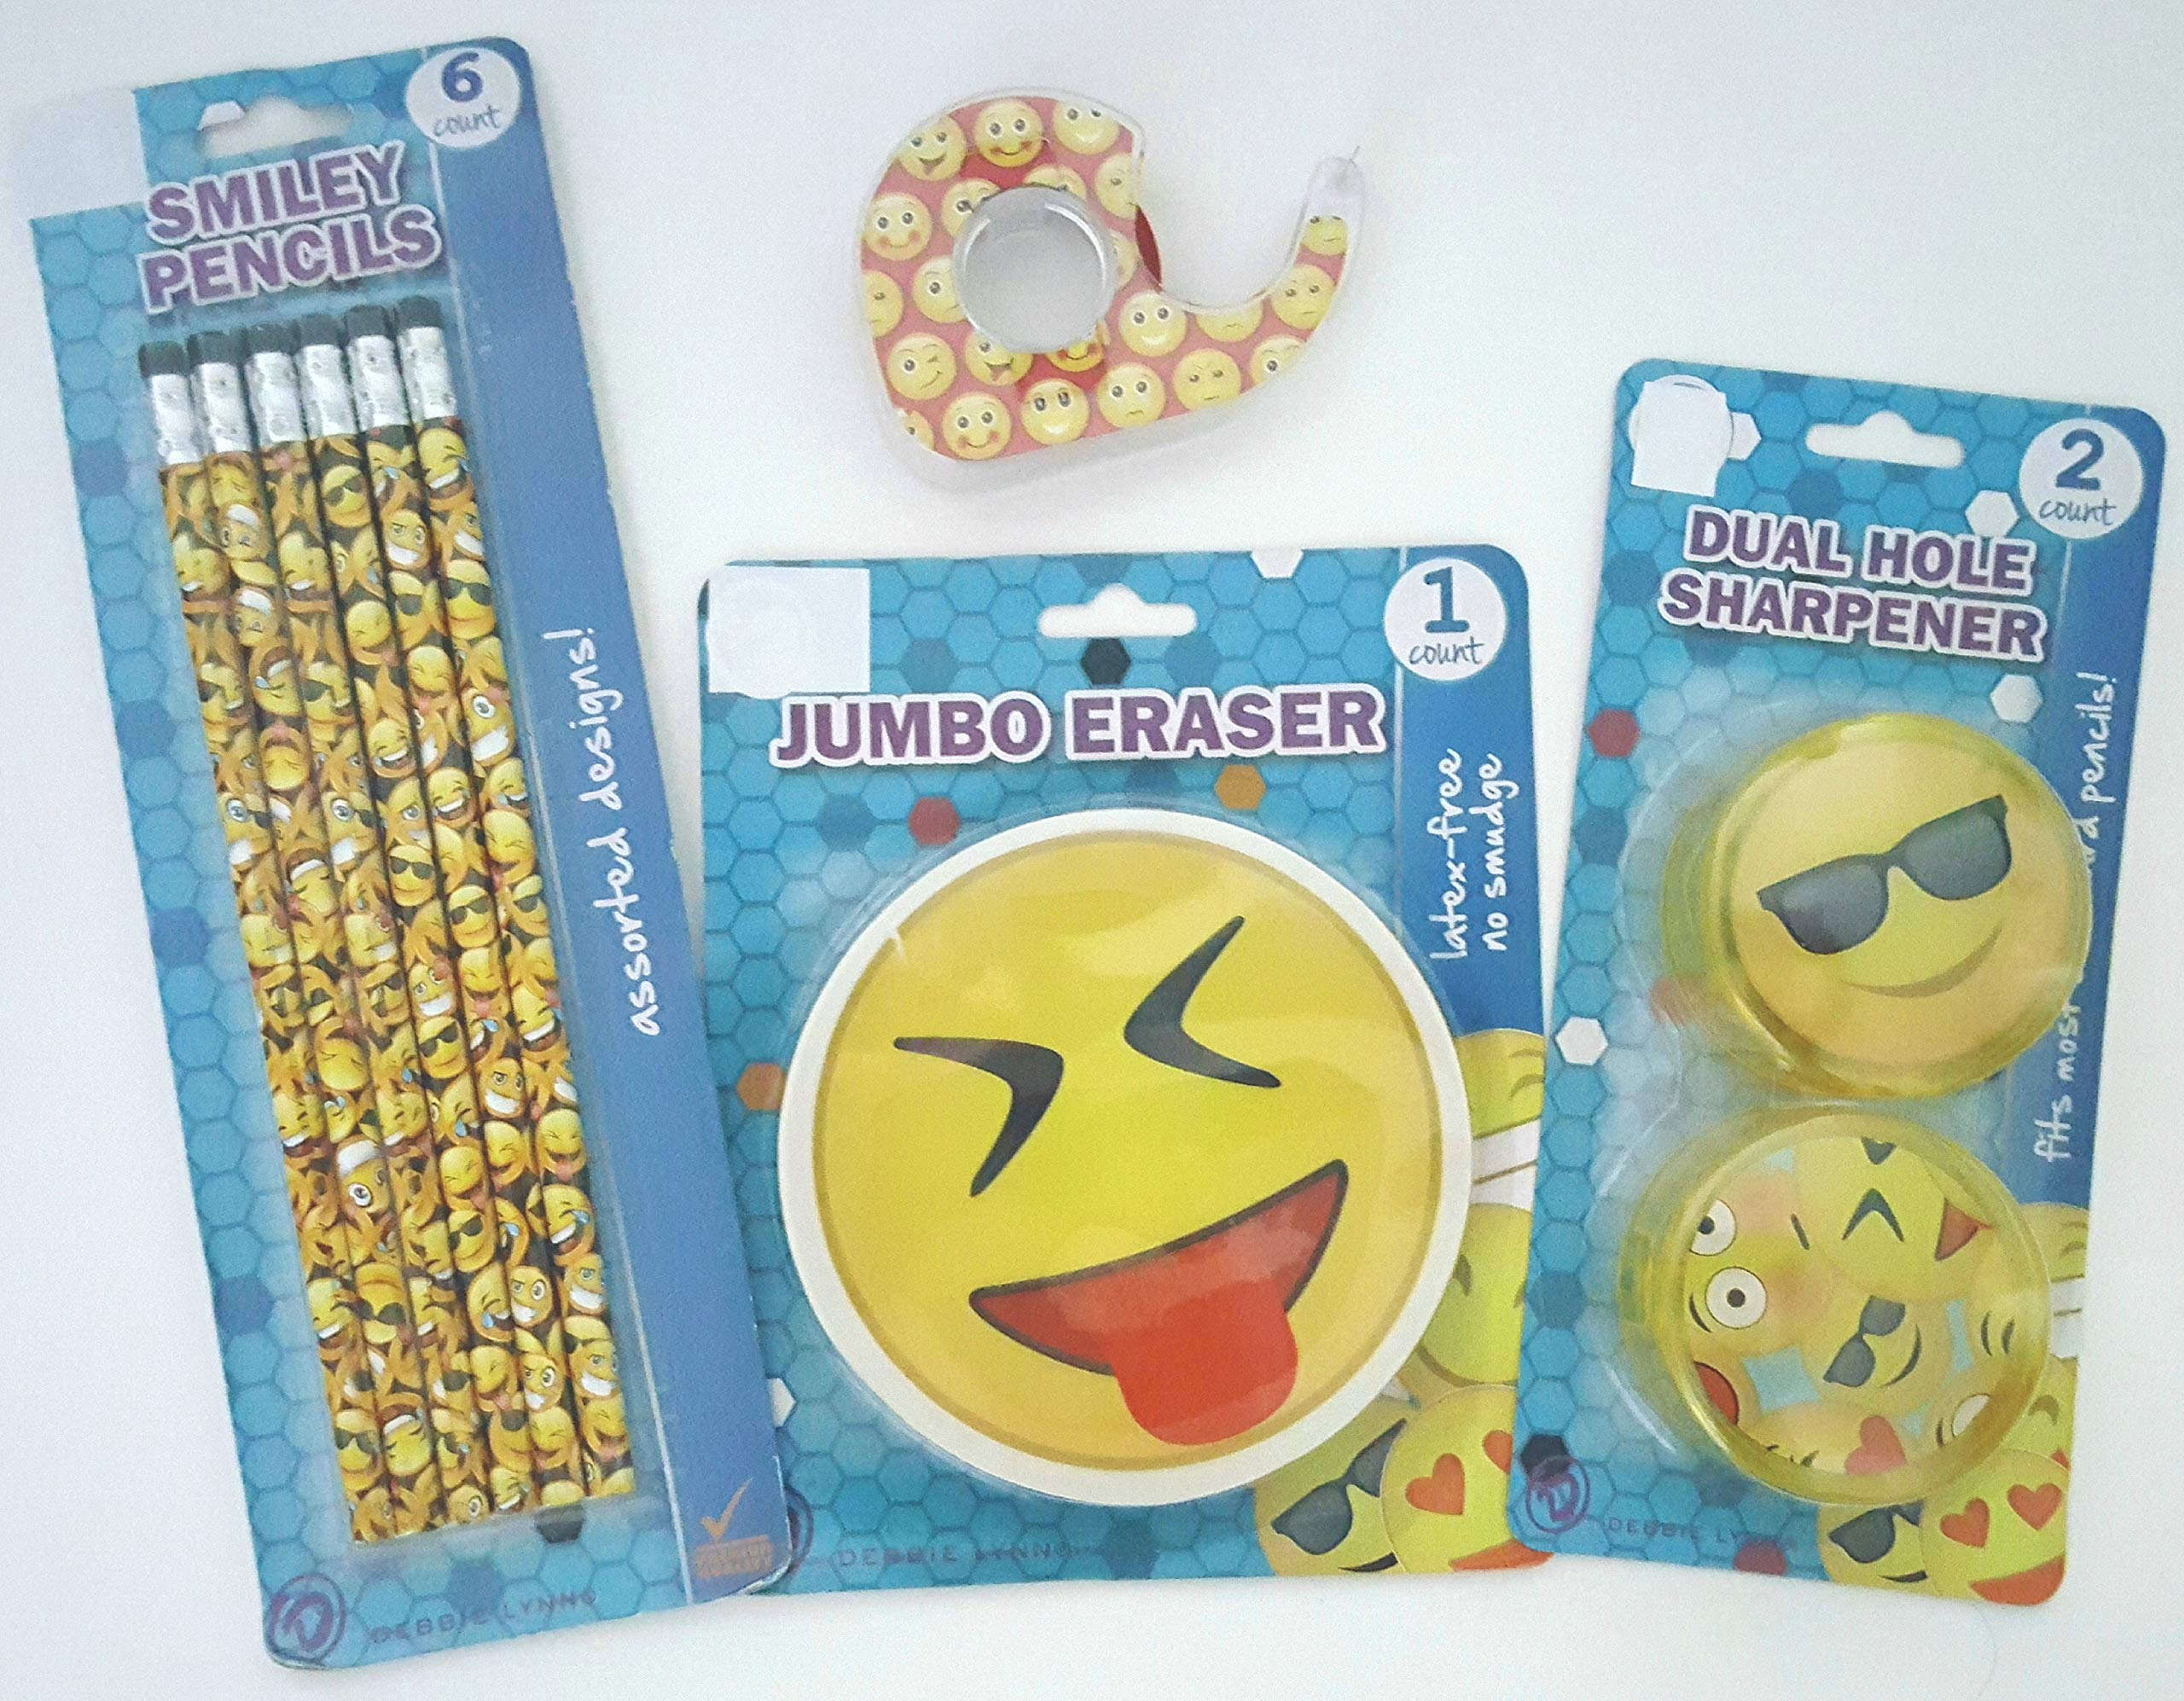 Emoji Smiley Back to School Bundle Set Teens Pencils Jumbo Eraser Dual Hole Sharpeners (2) Tape 4 Piece Set